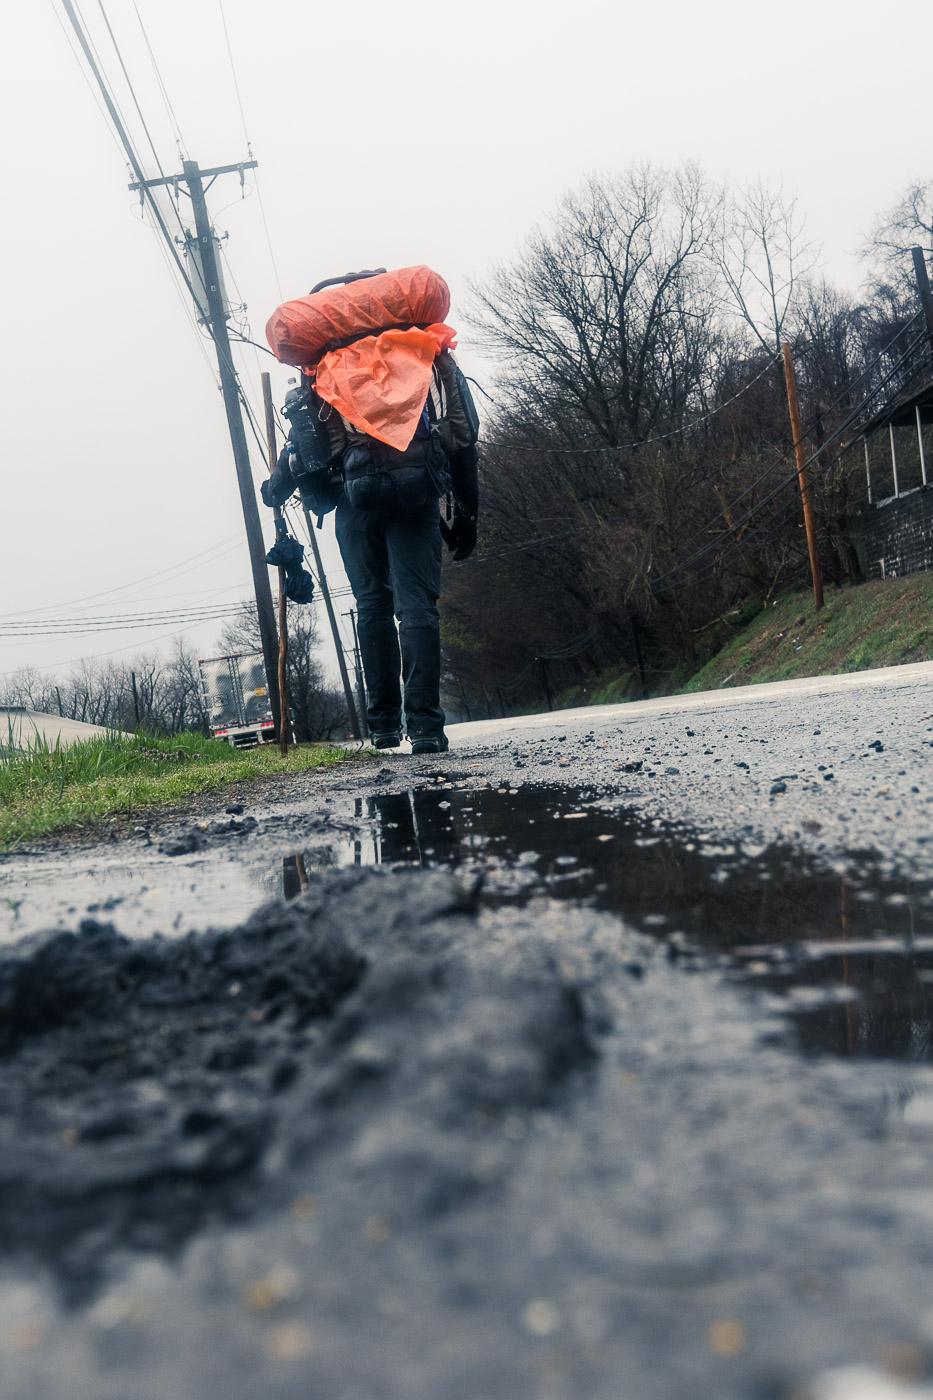 Rain And Mud And HikerTrash \ \ 4/6/17